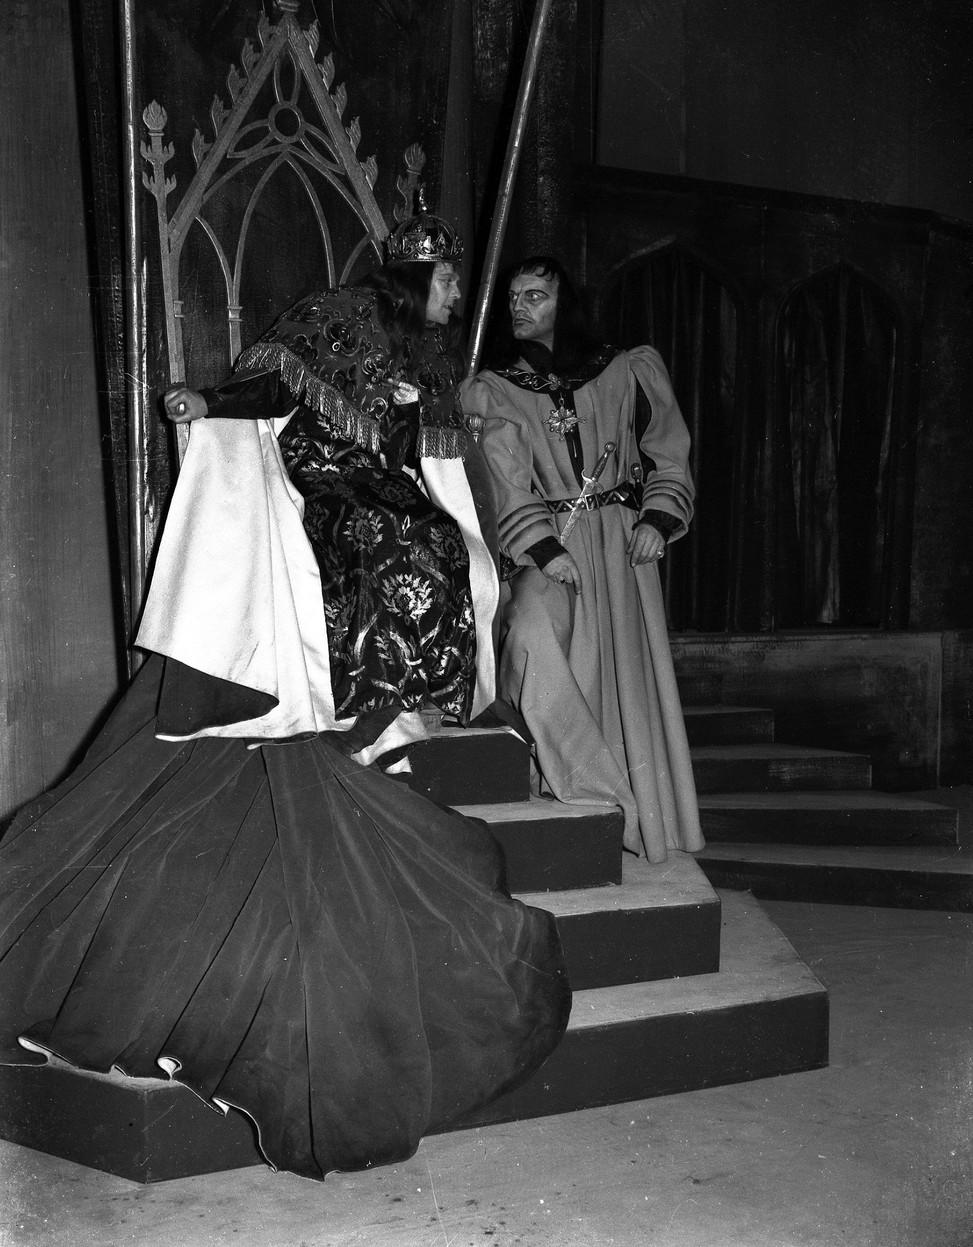 Marius Goring as Richard III and Harry Andrews as Buckingham in Shakespeare's 'Richard III' 1953